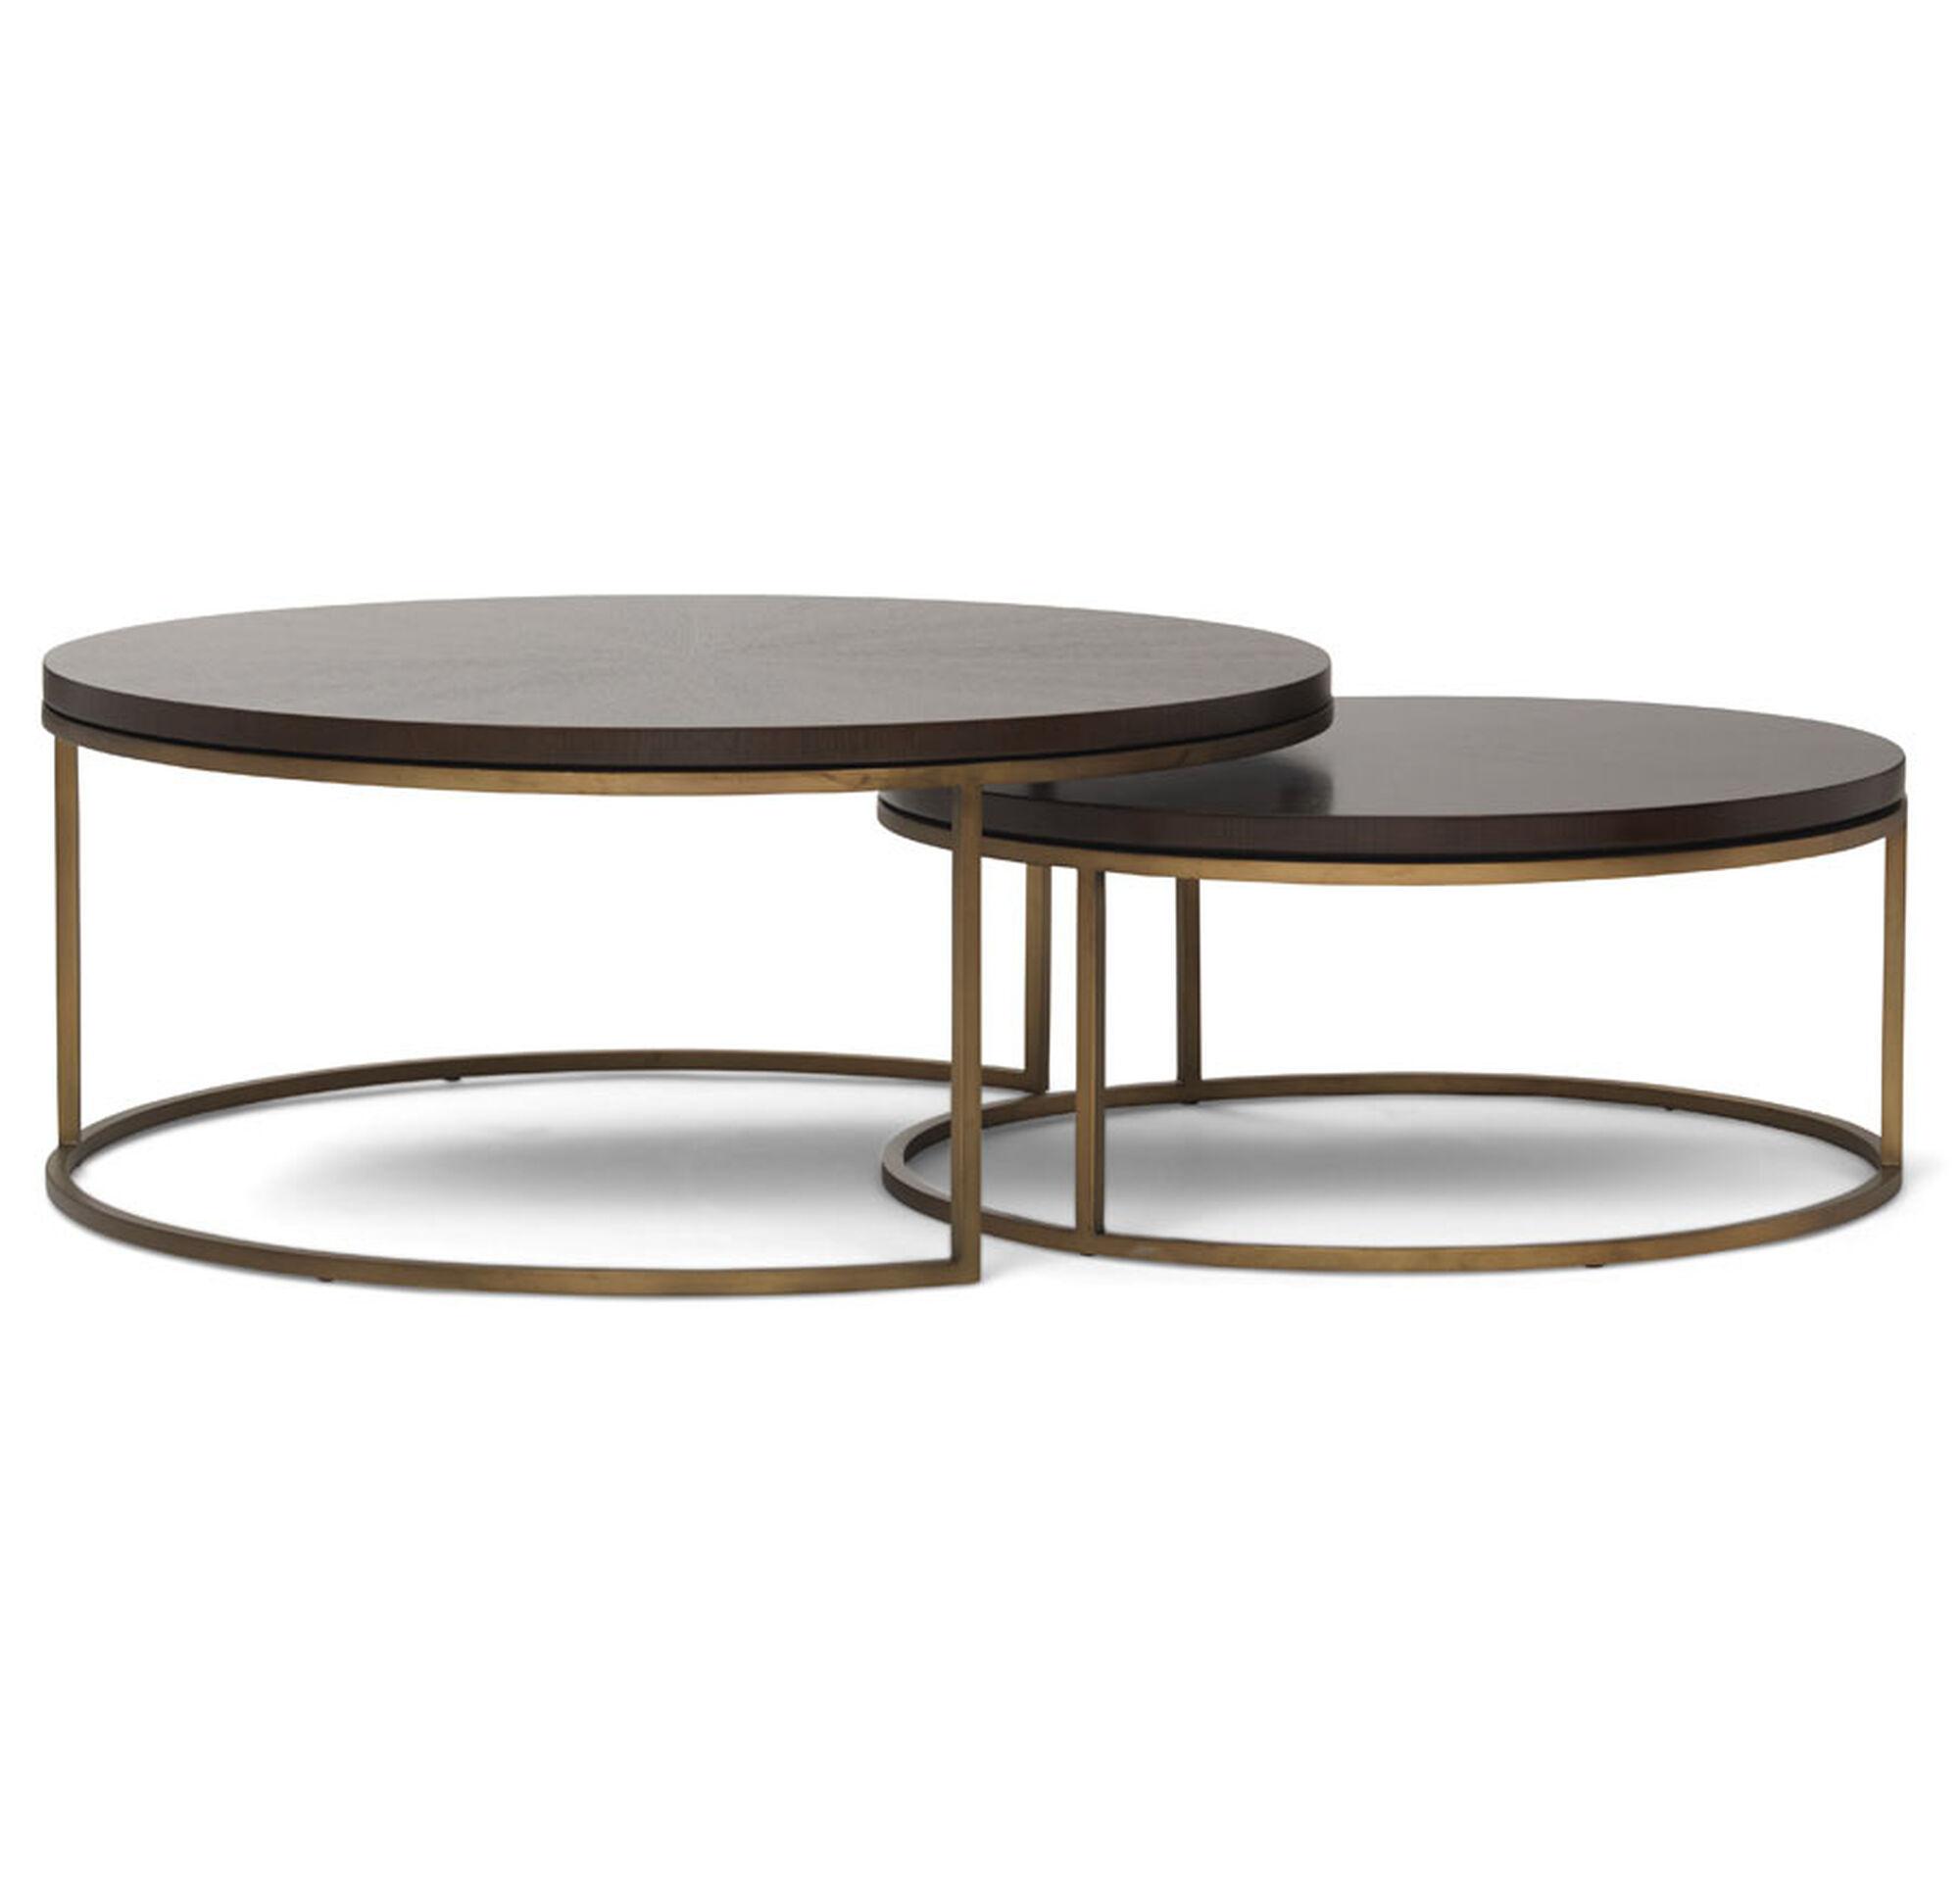 Nesting Sofa Tables Savings On Catherine Console